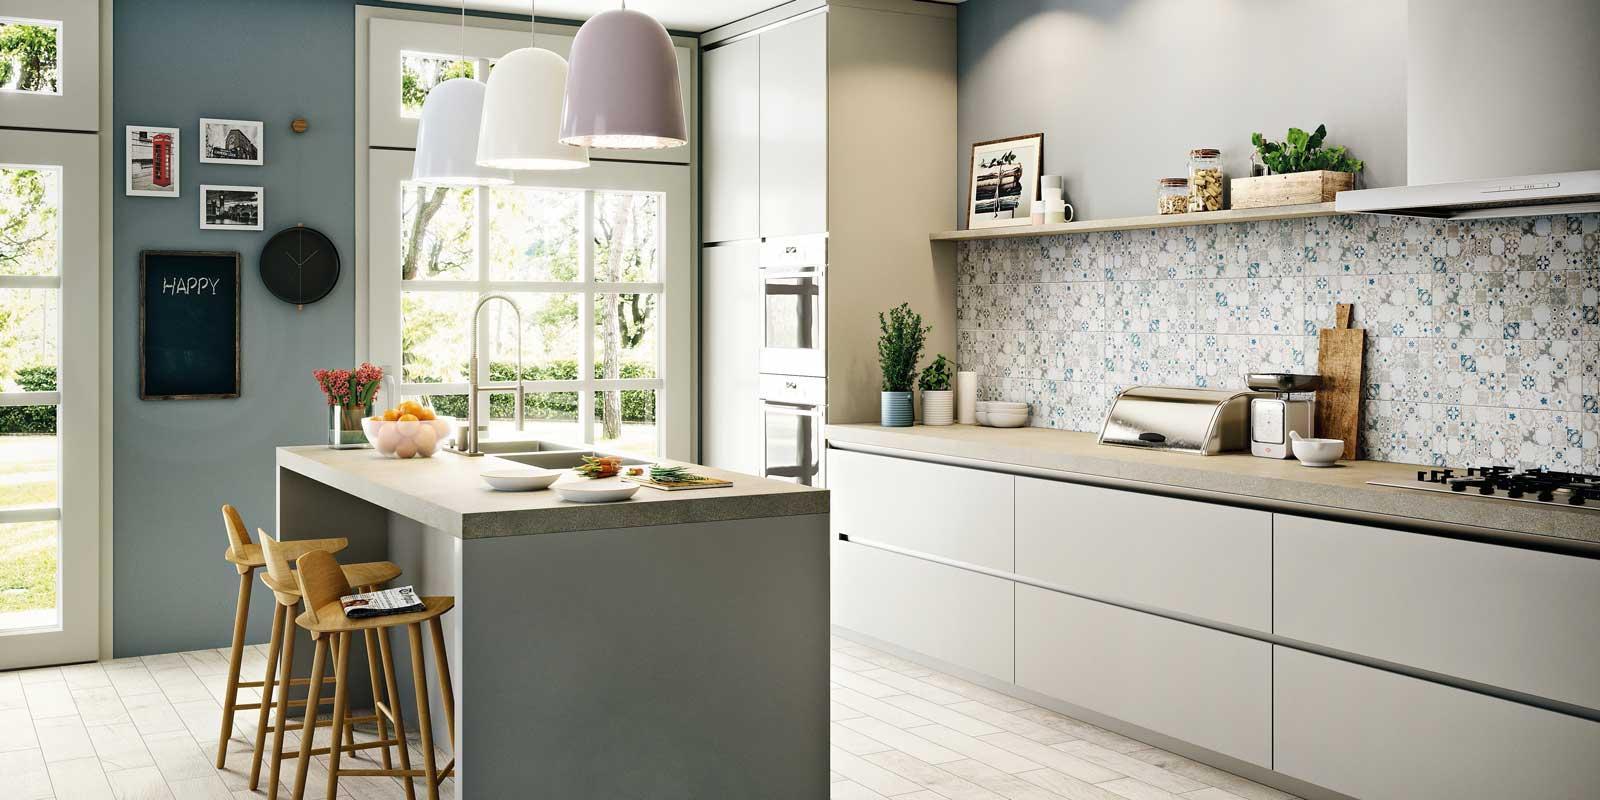 Piastrelle per cucina a prova di macchia cose di casa for Rivestimenti per cucine classiche